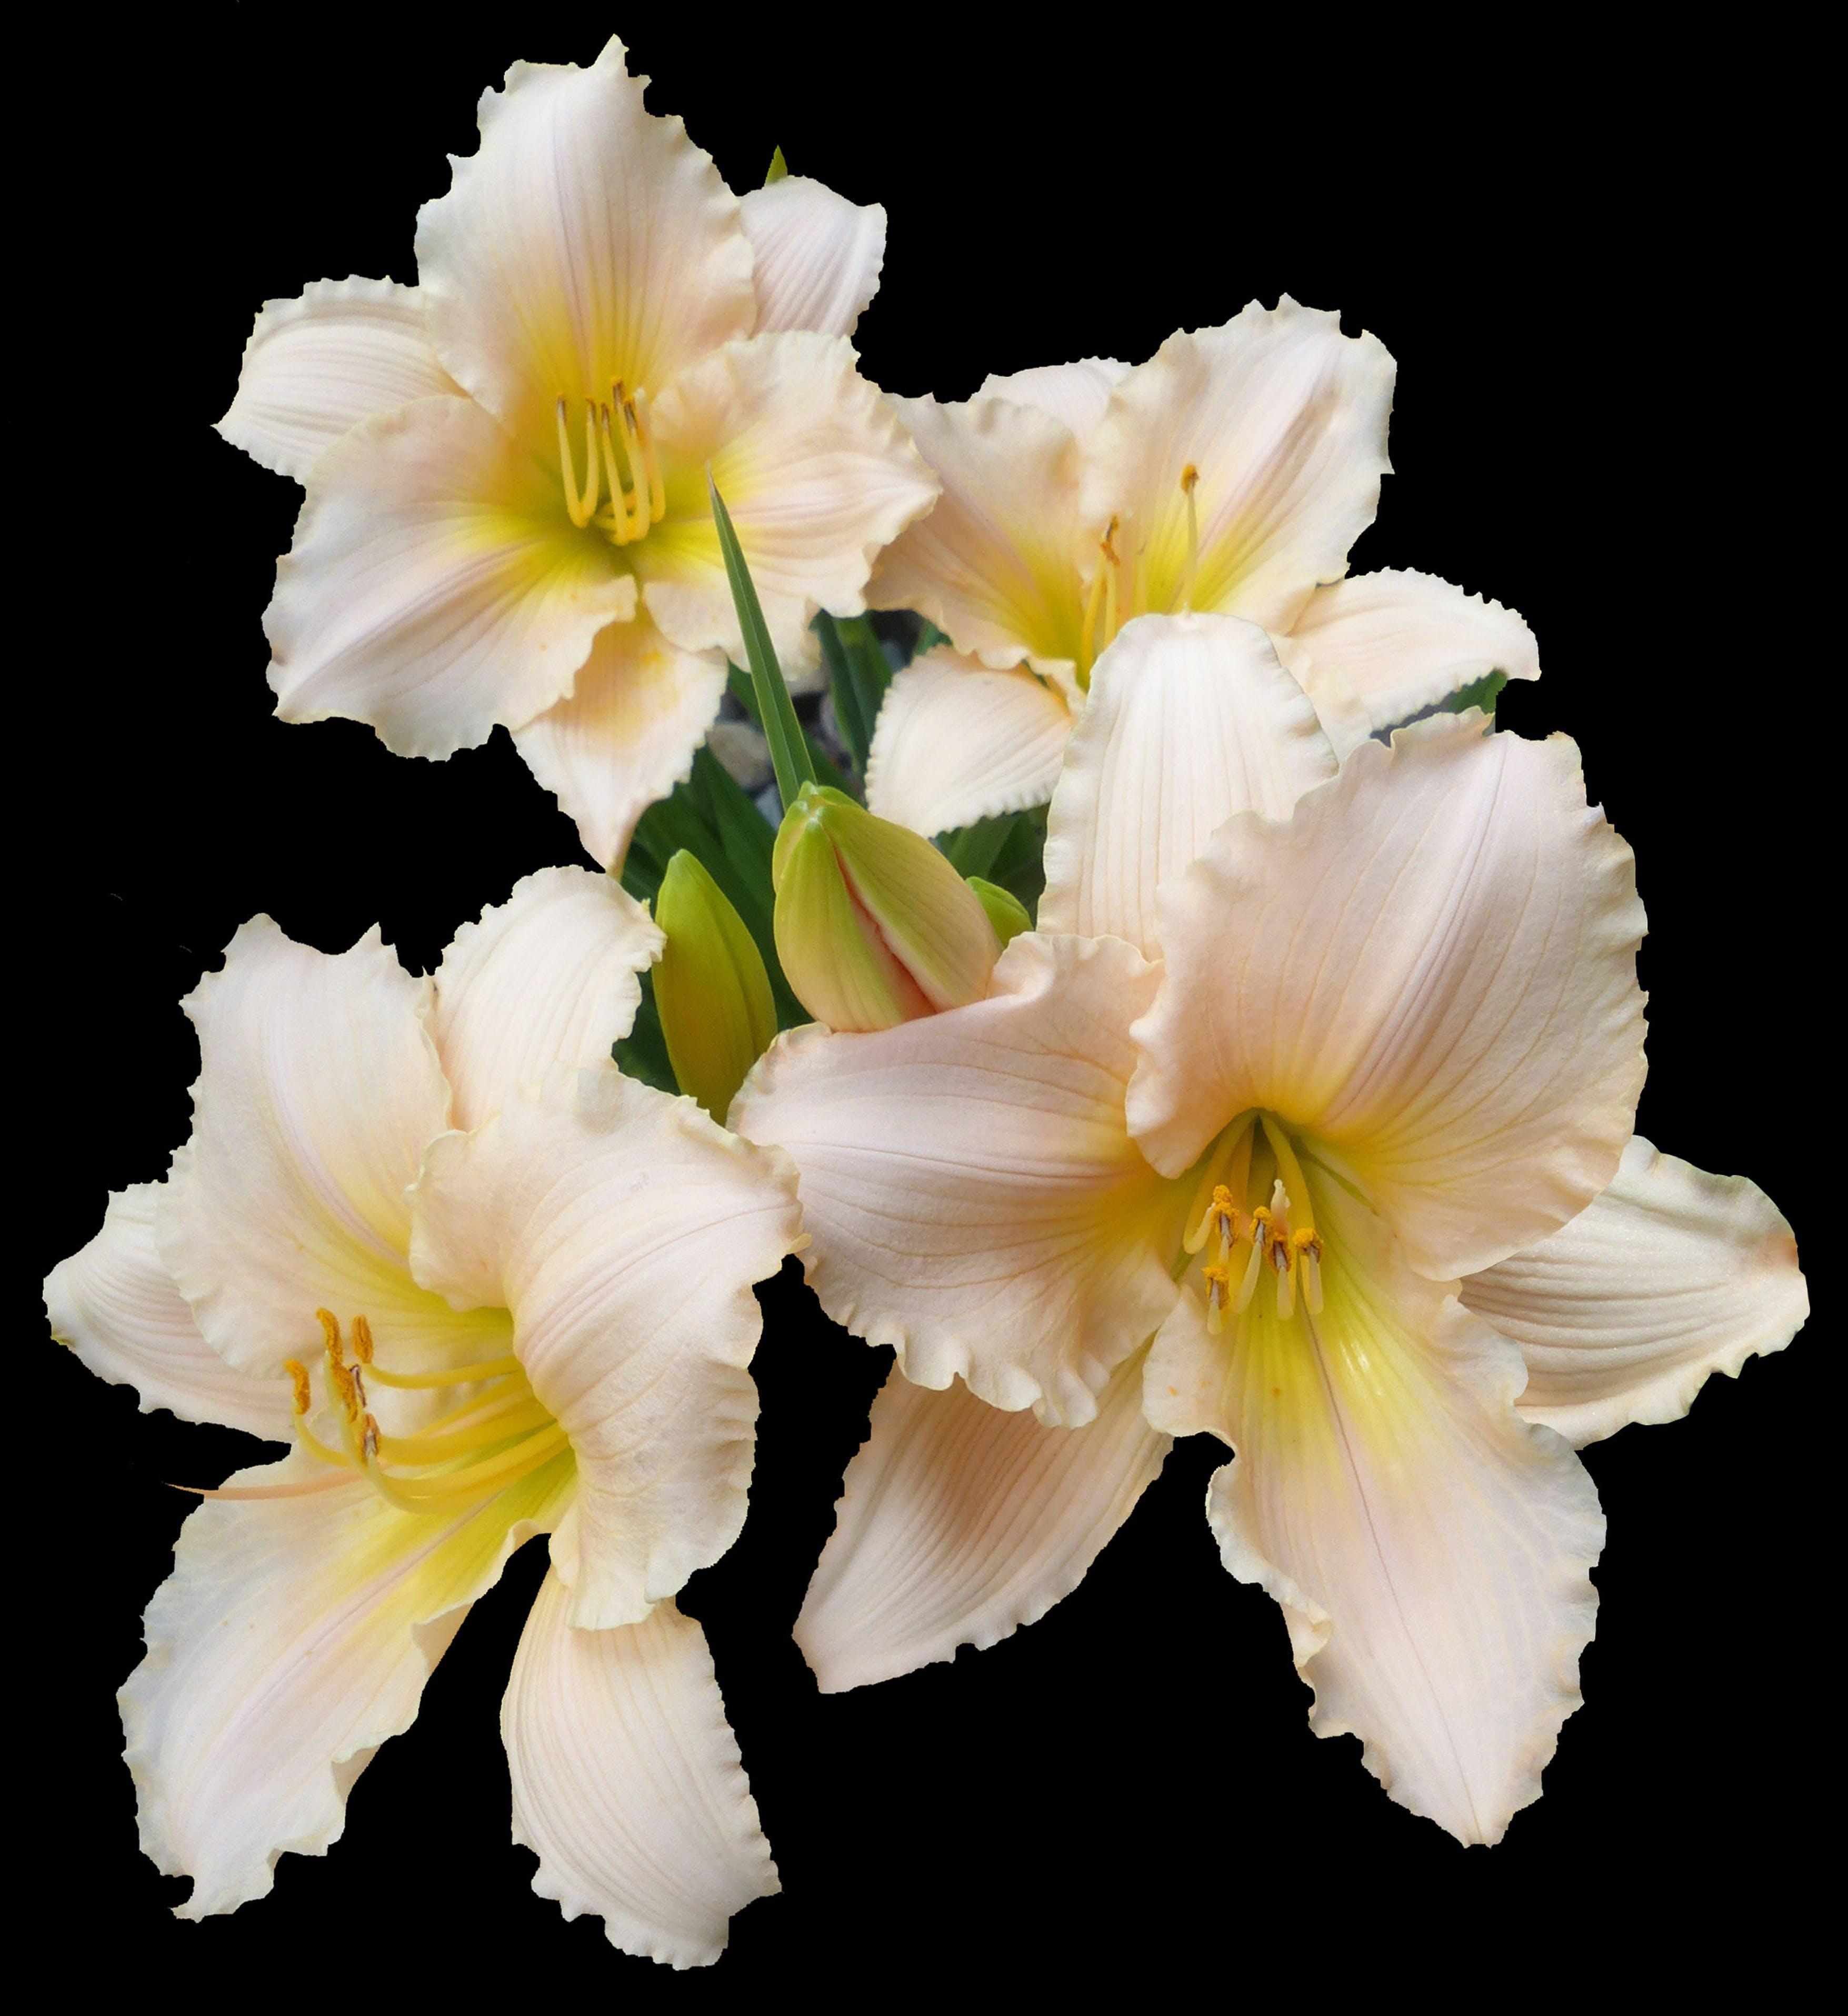 Kostenloses Stock Foto zu lillies